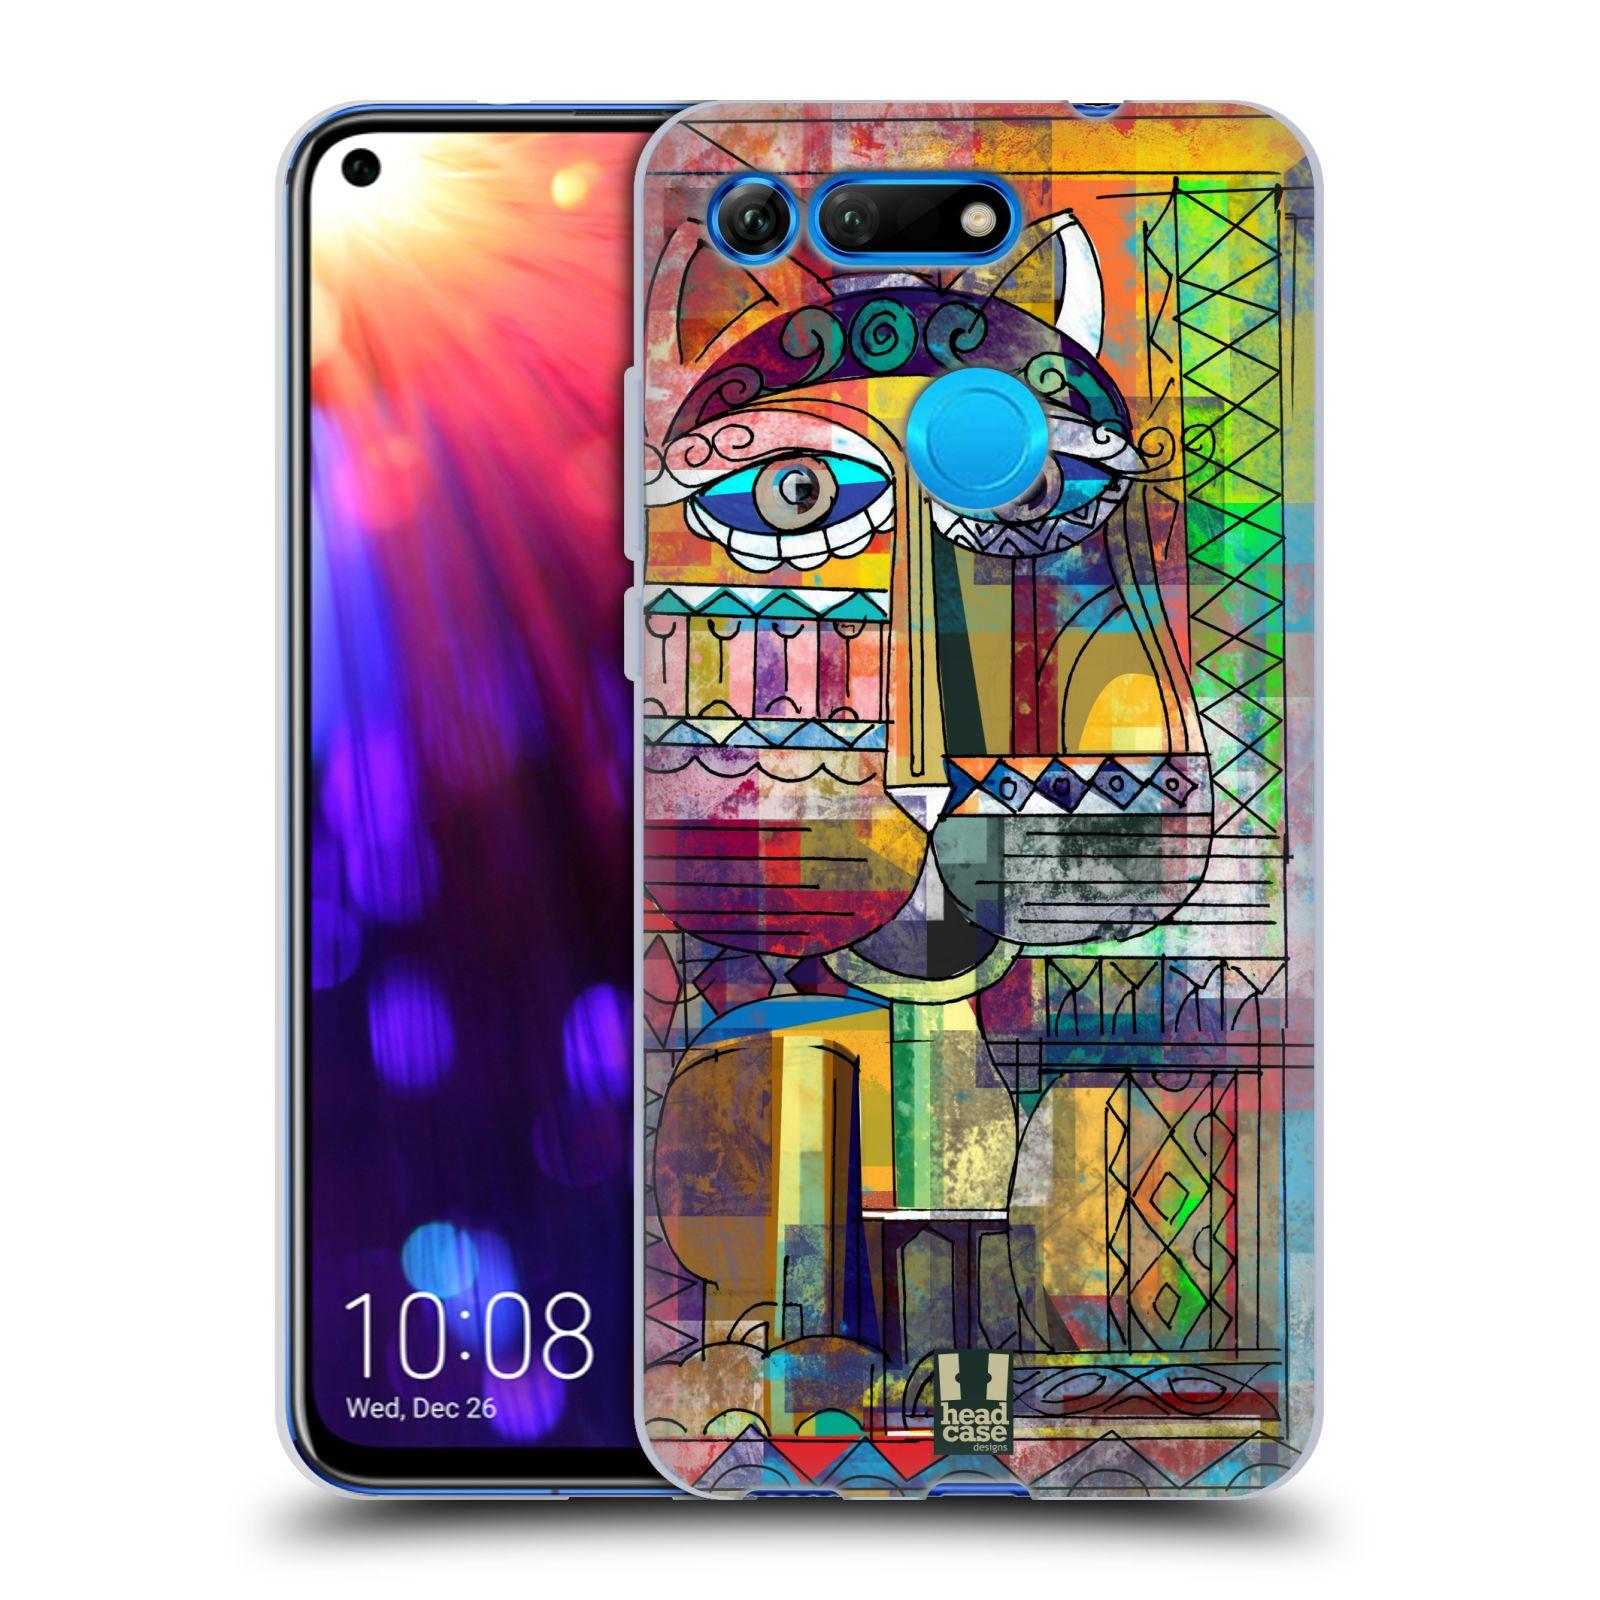 Silikonové pouzdro na mobil Honor View 20 - Head Case - AZTEC KORAT